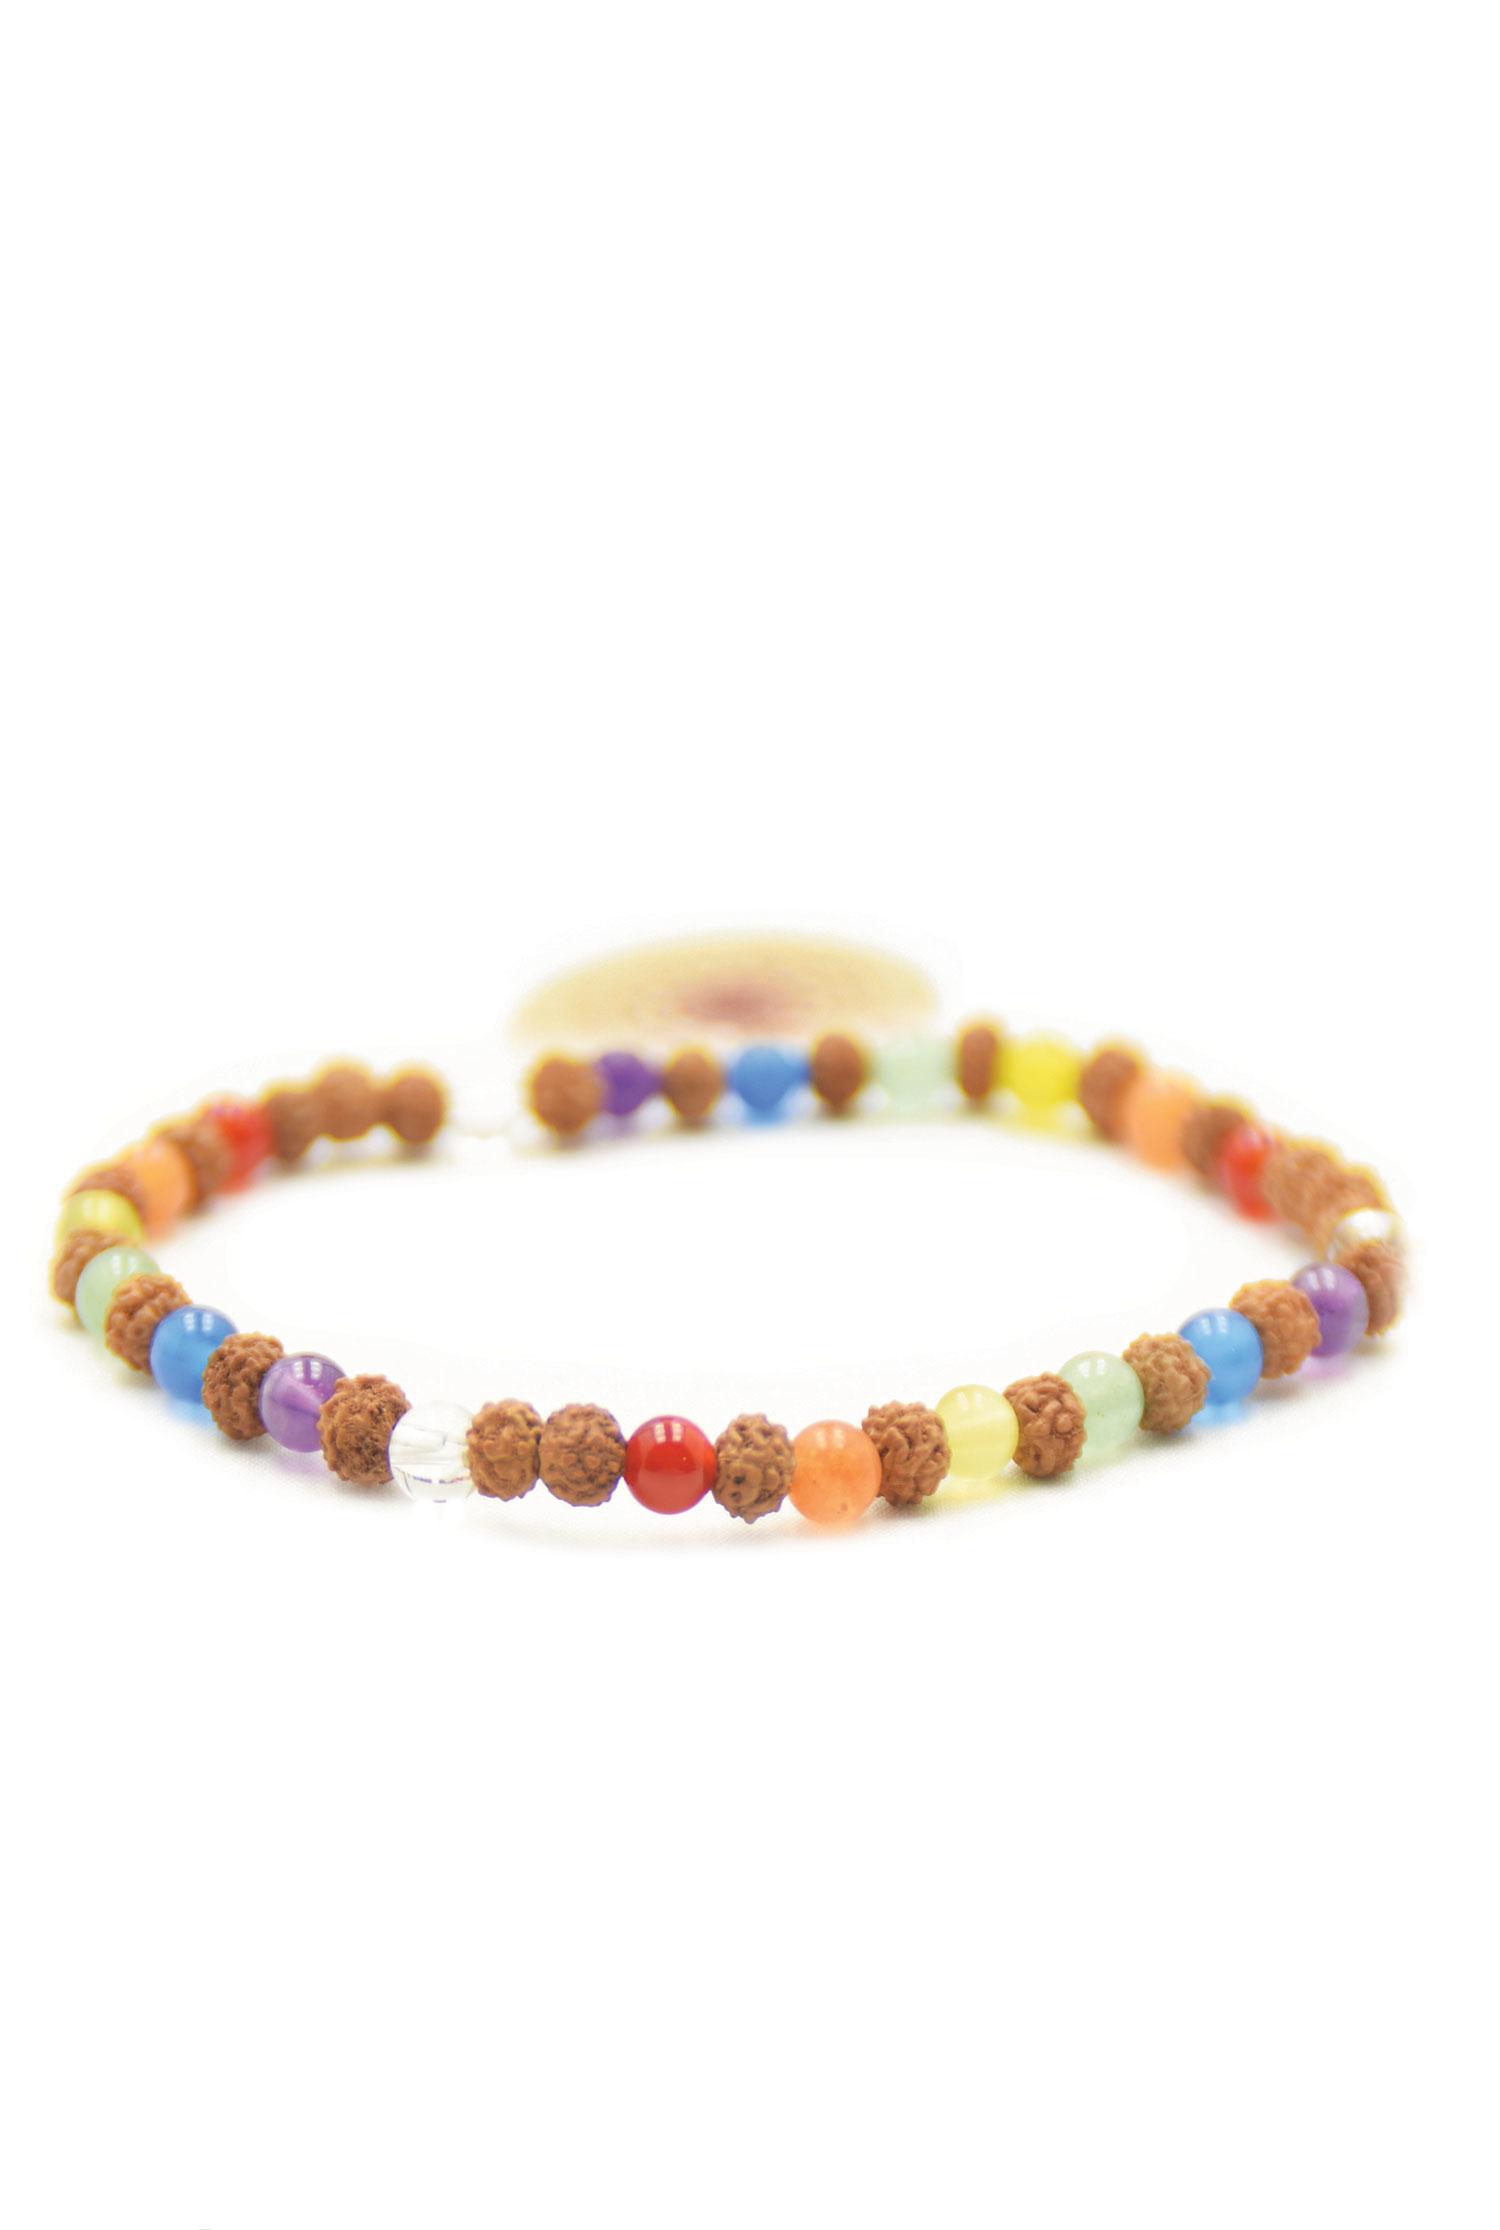 Chakra Power mala bracelet